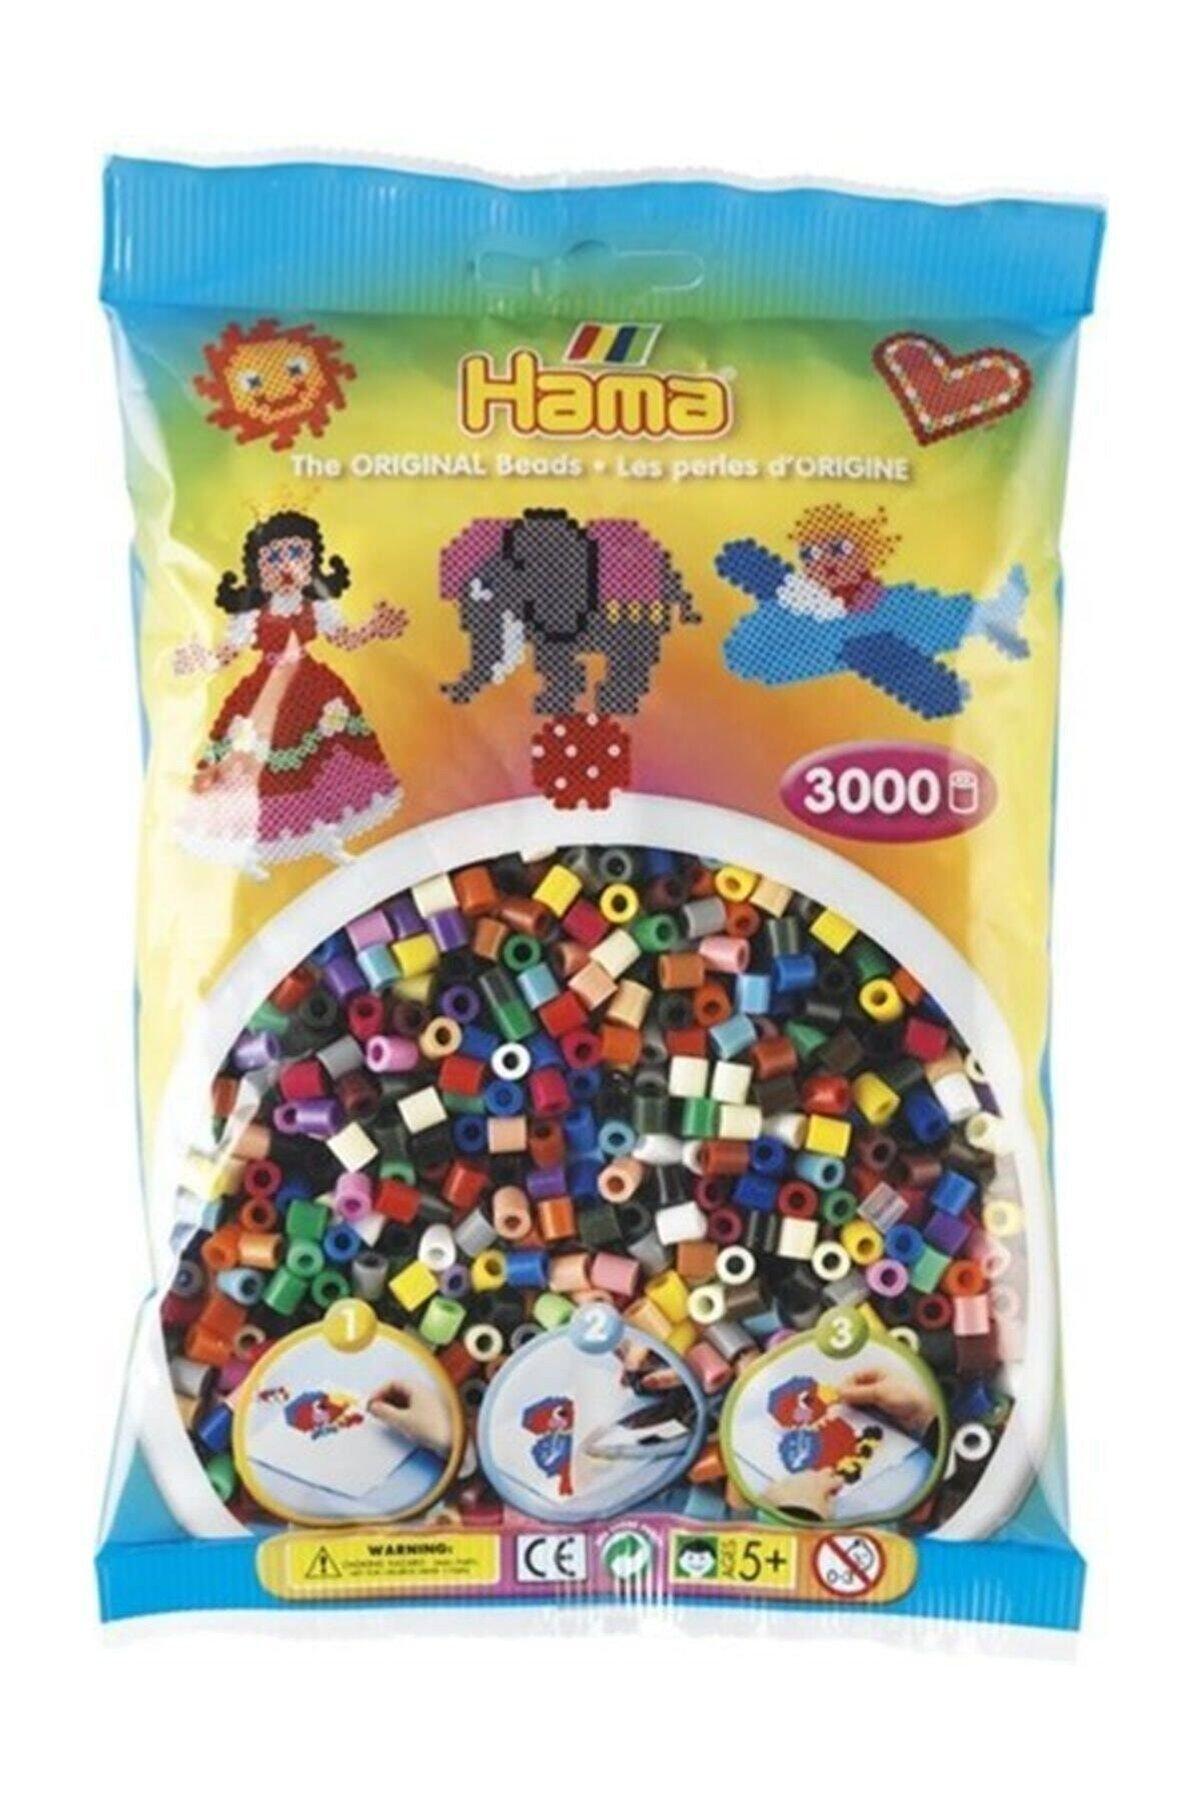 Hama Midi Boncuk 3.000'lik - 22 Renk